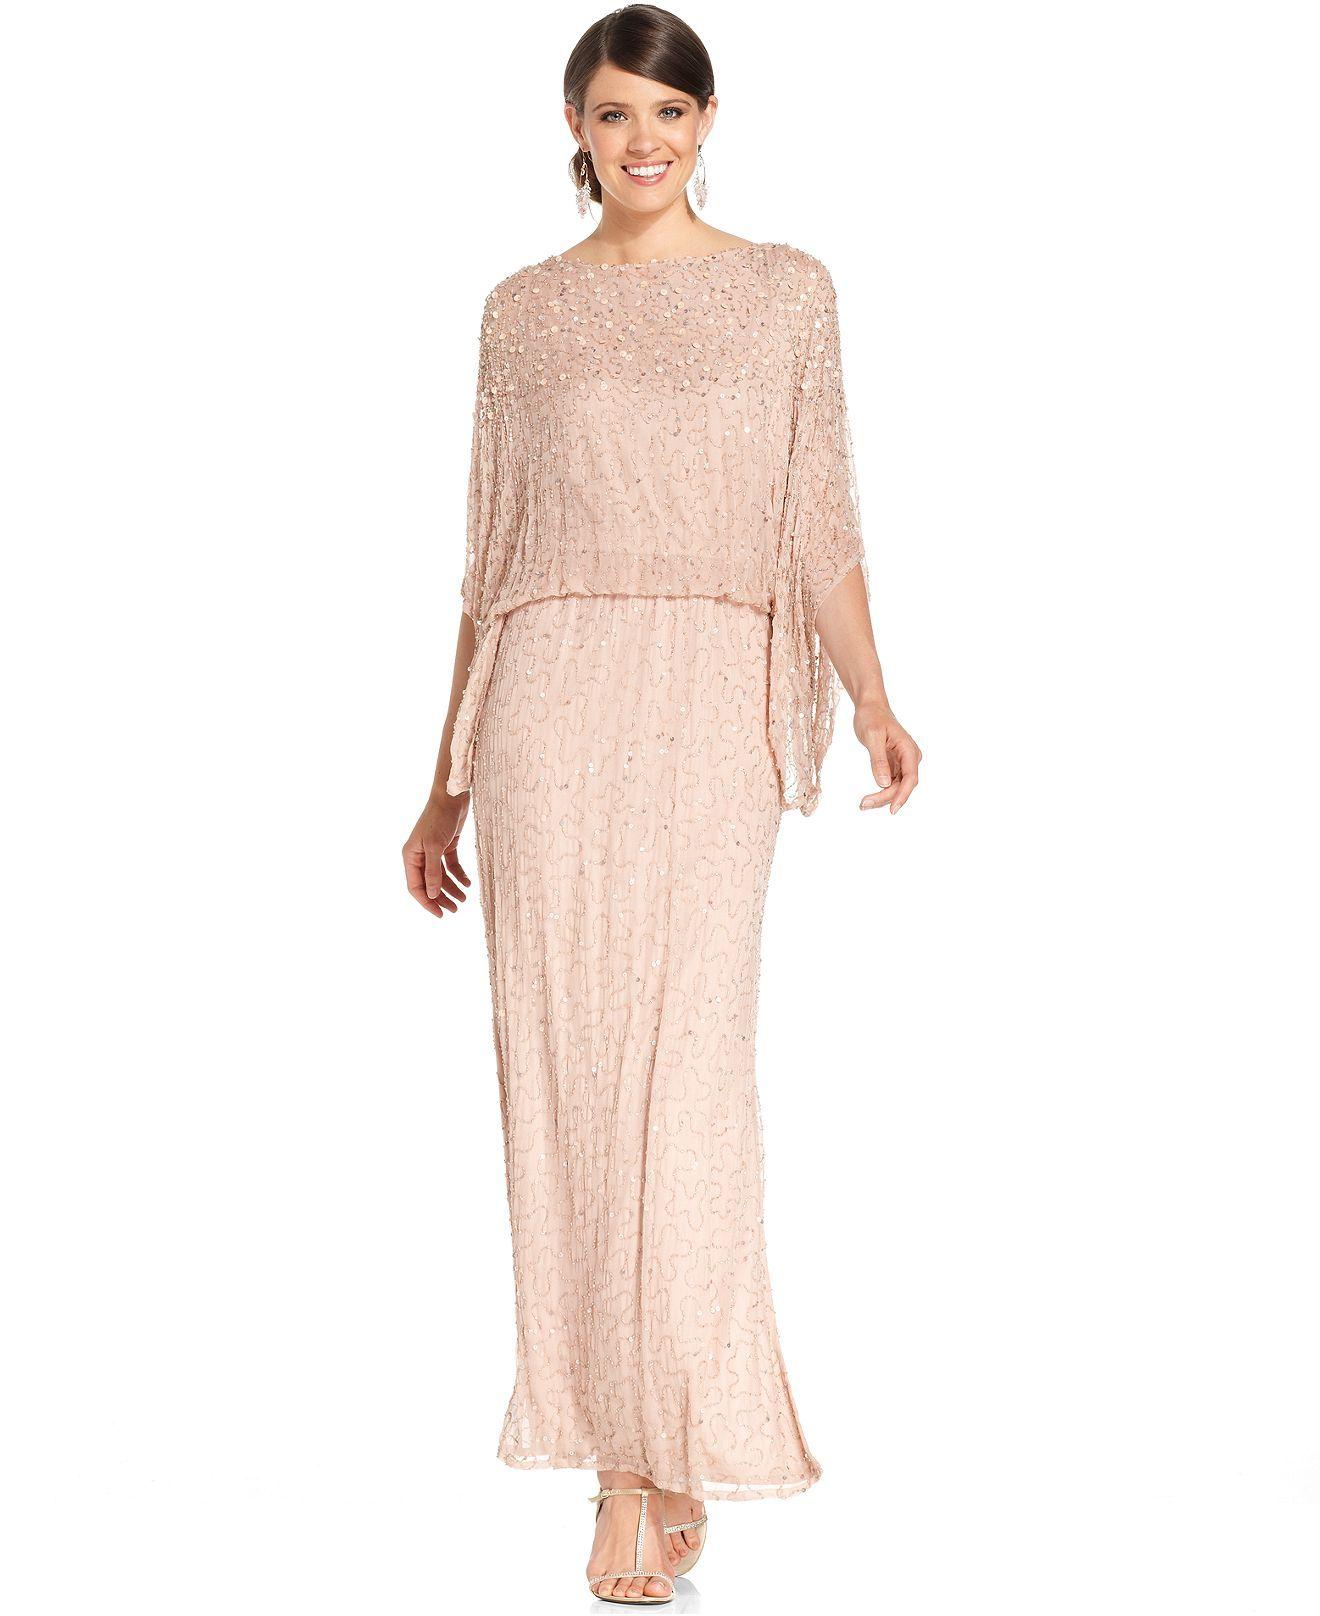 Macy's Dresses For Weddings   Patra Kimono Sleeve Beaded Blouson Gown Dresses Women Macy S